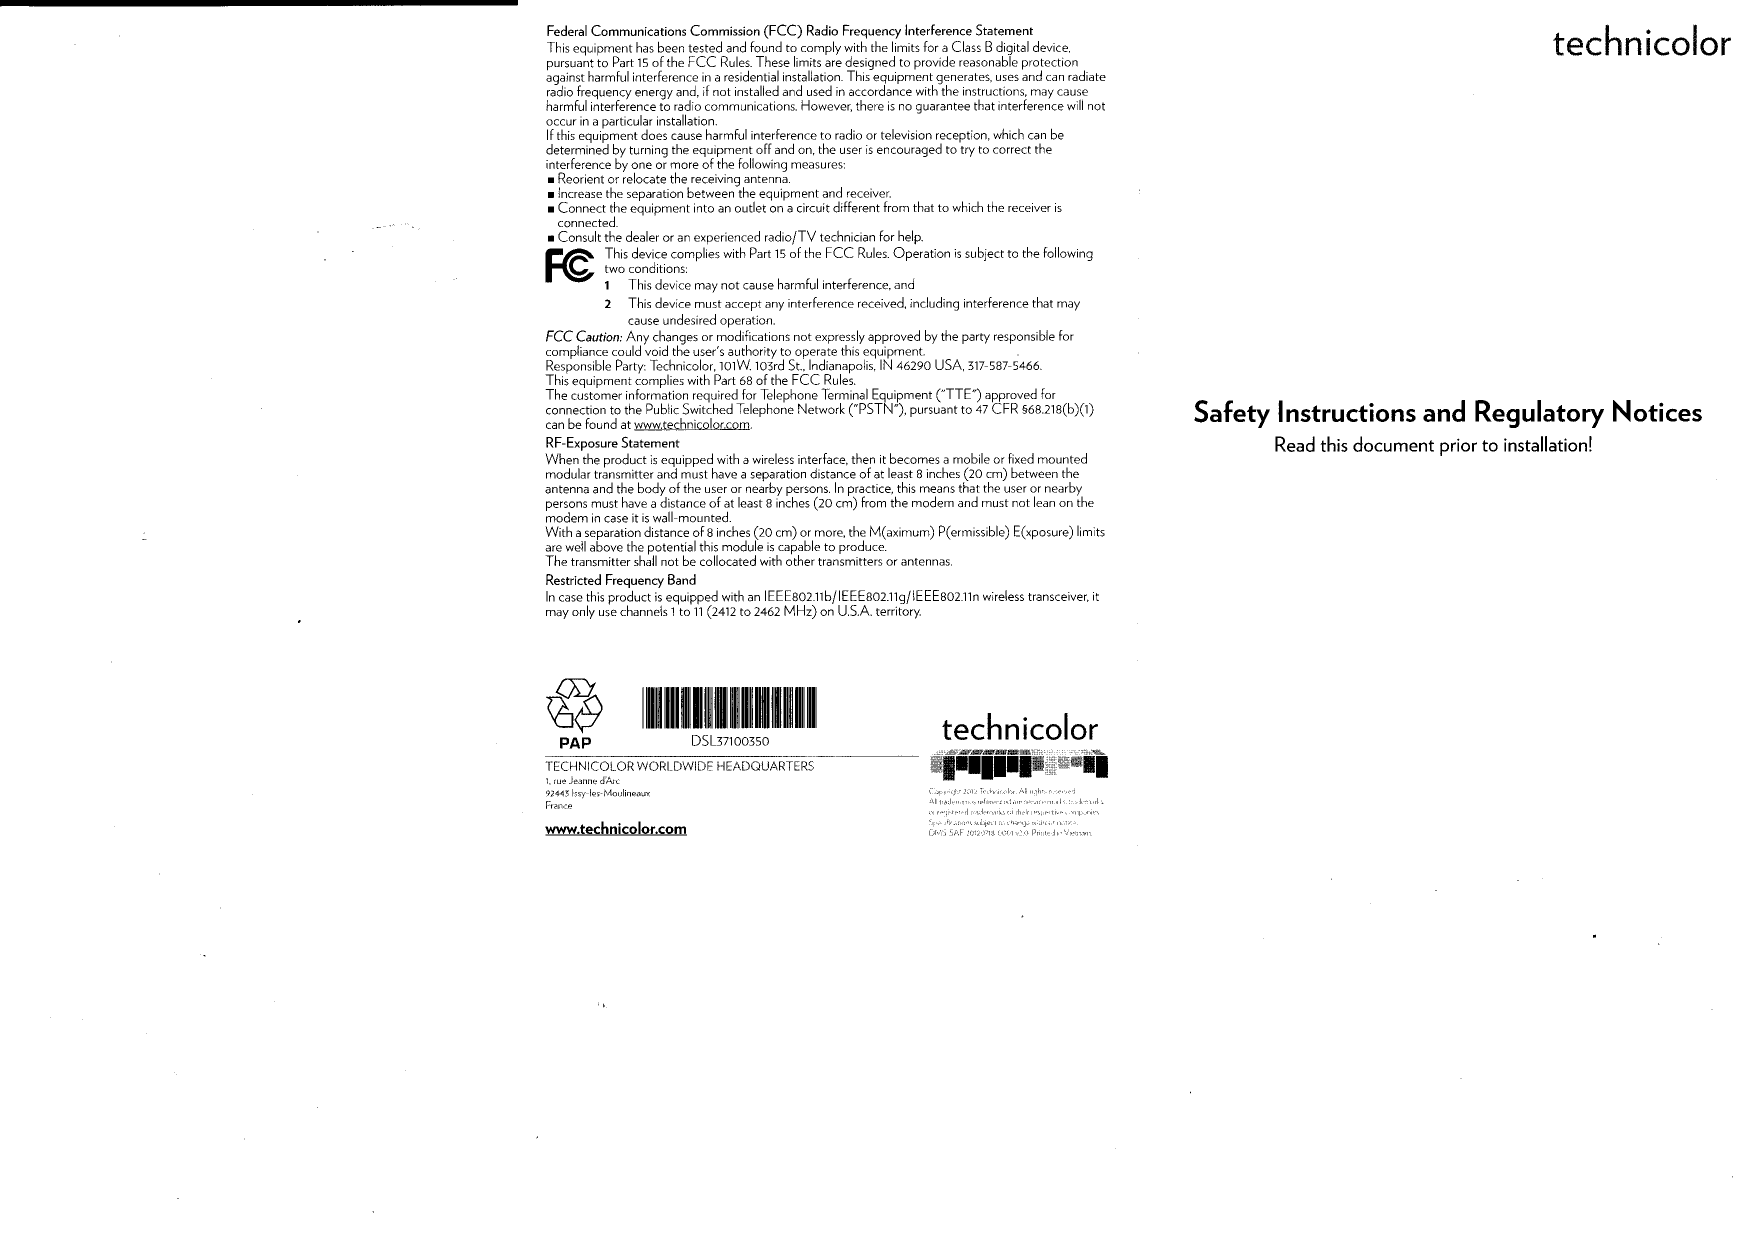 mars fishcare test kit instructions